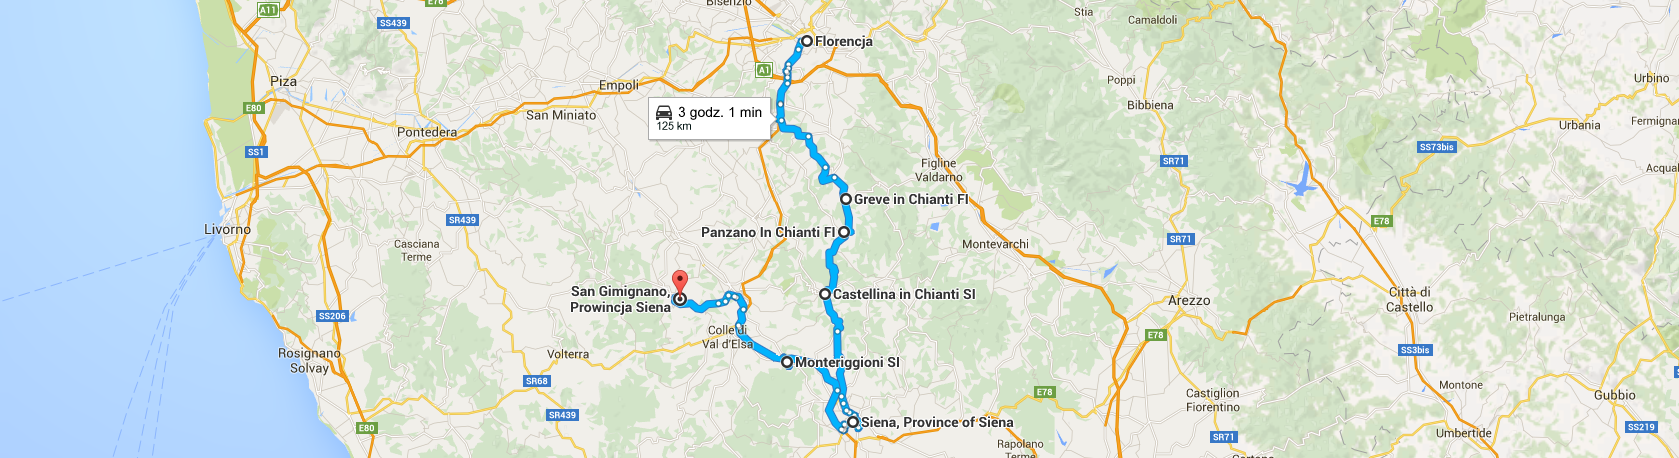 Trasa z Florencji do San Gimignano